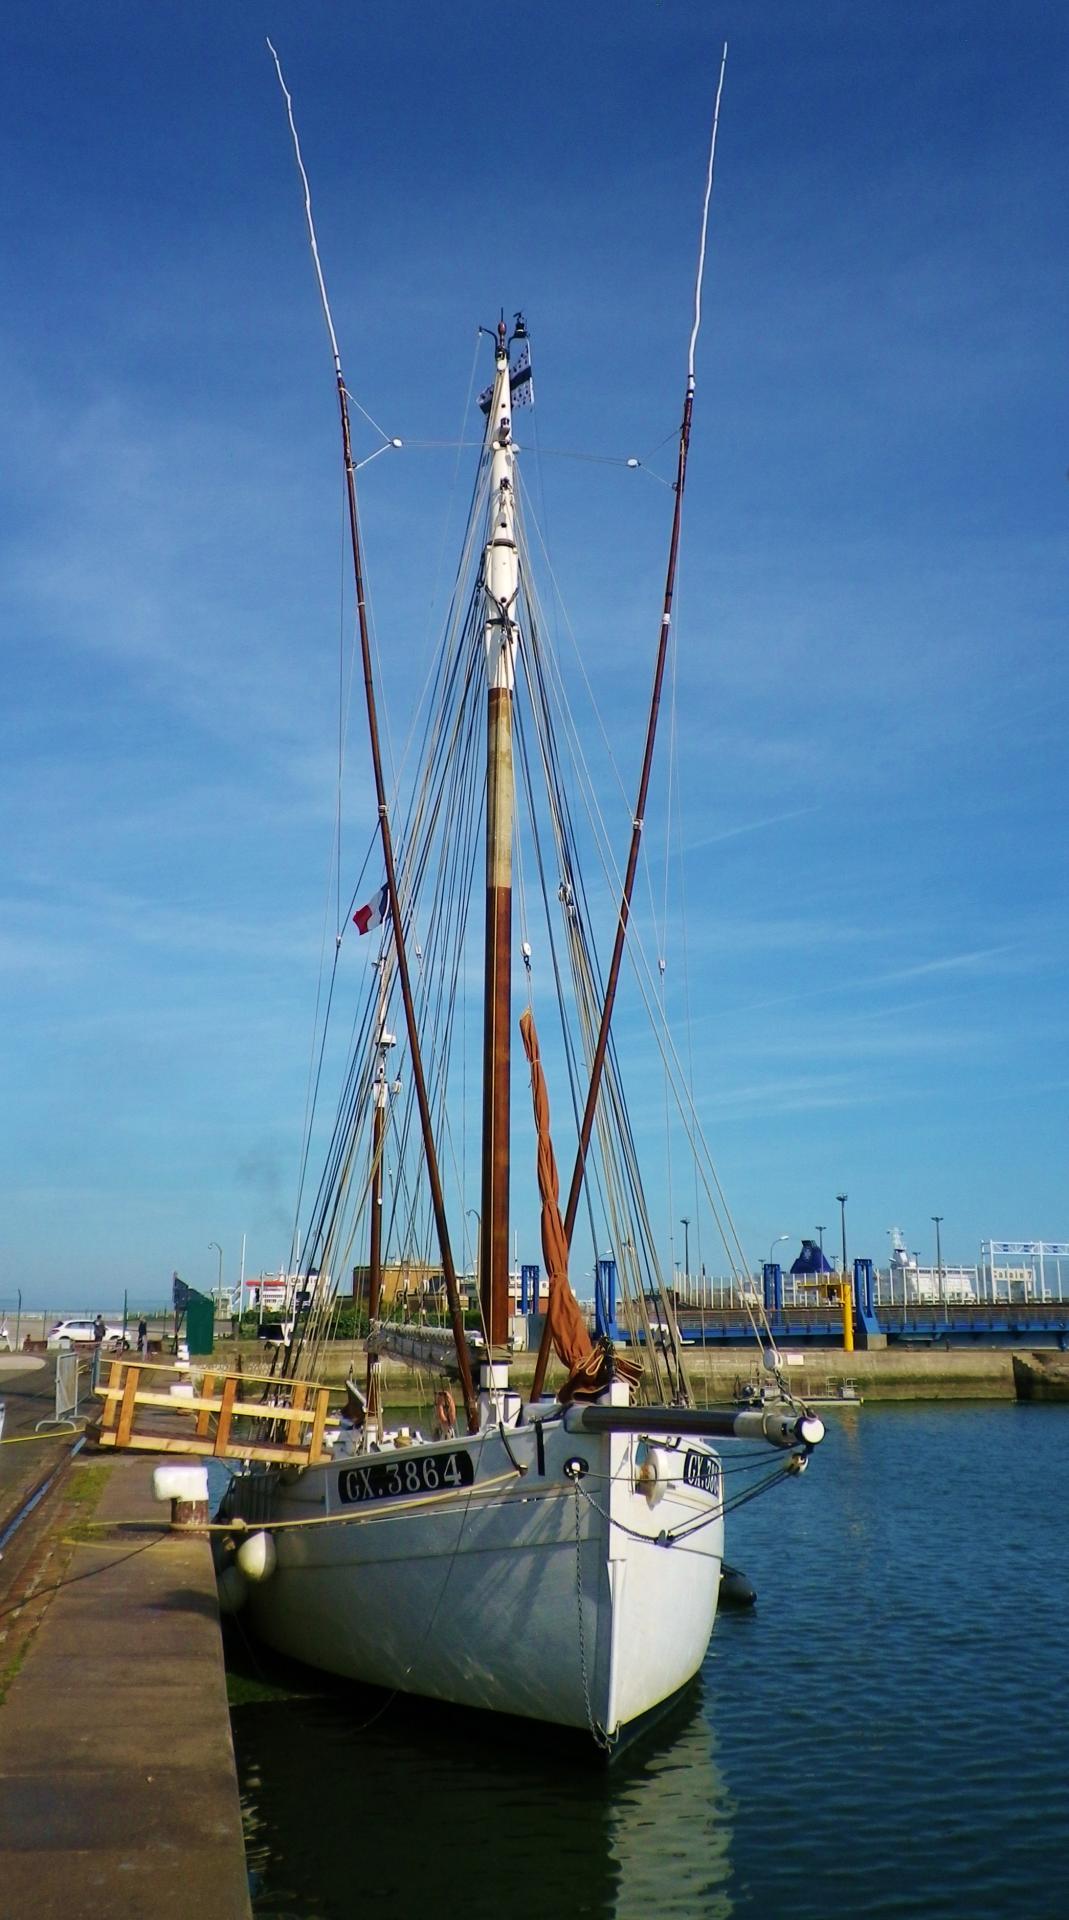 Fete maritime a calais juin 2014